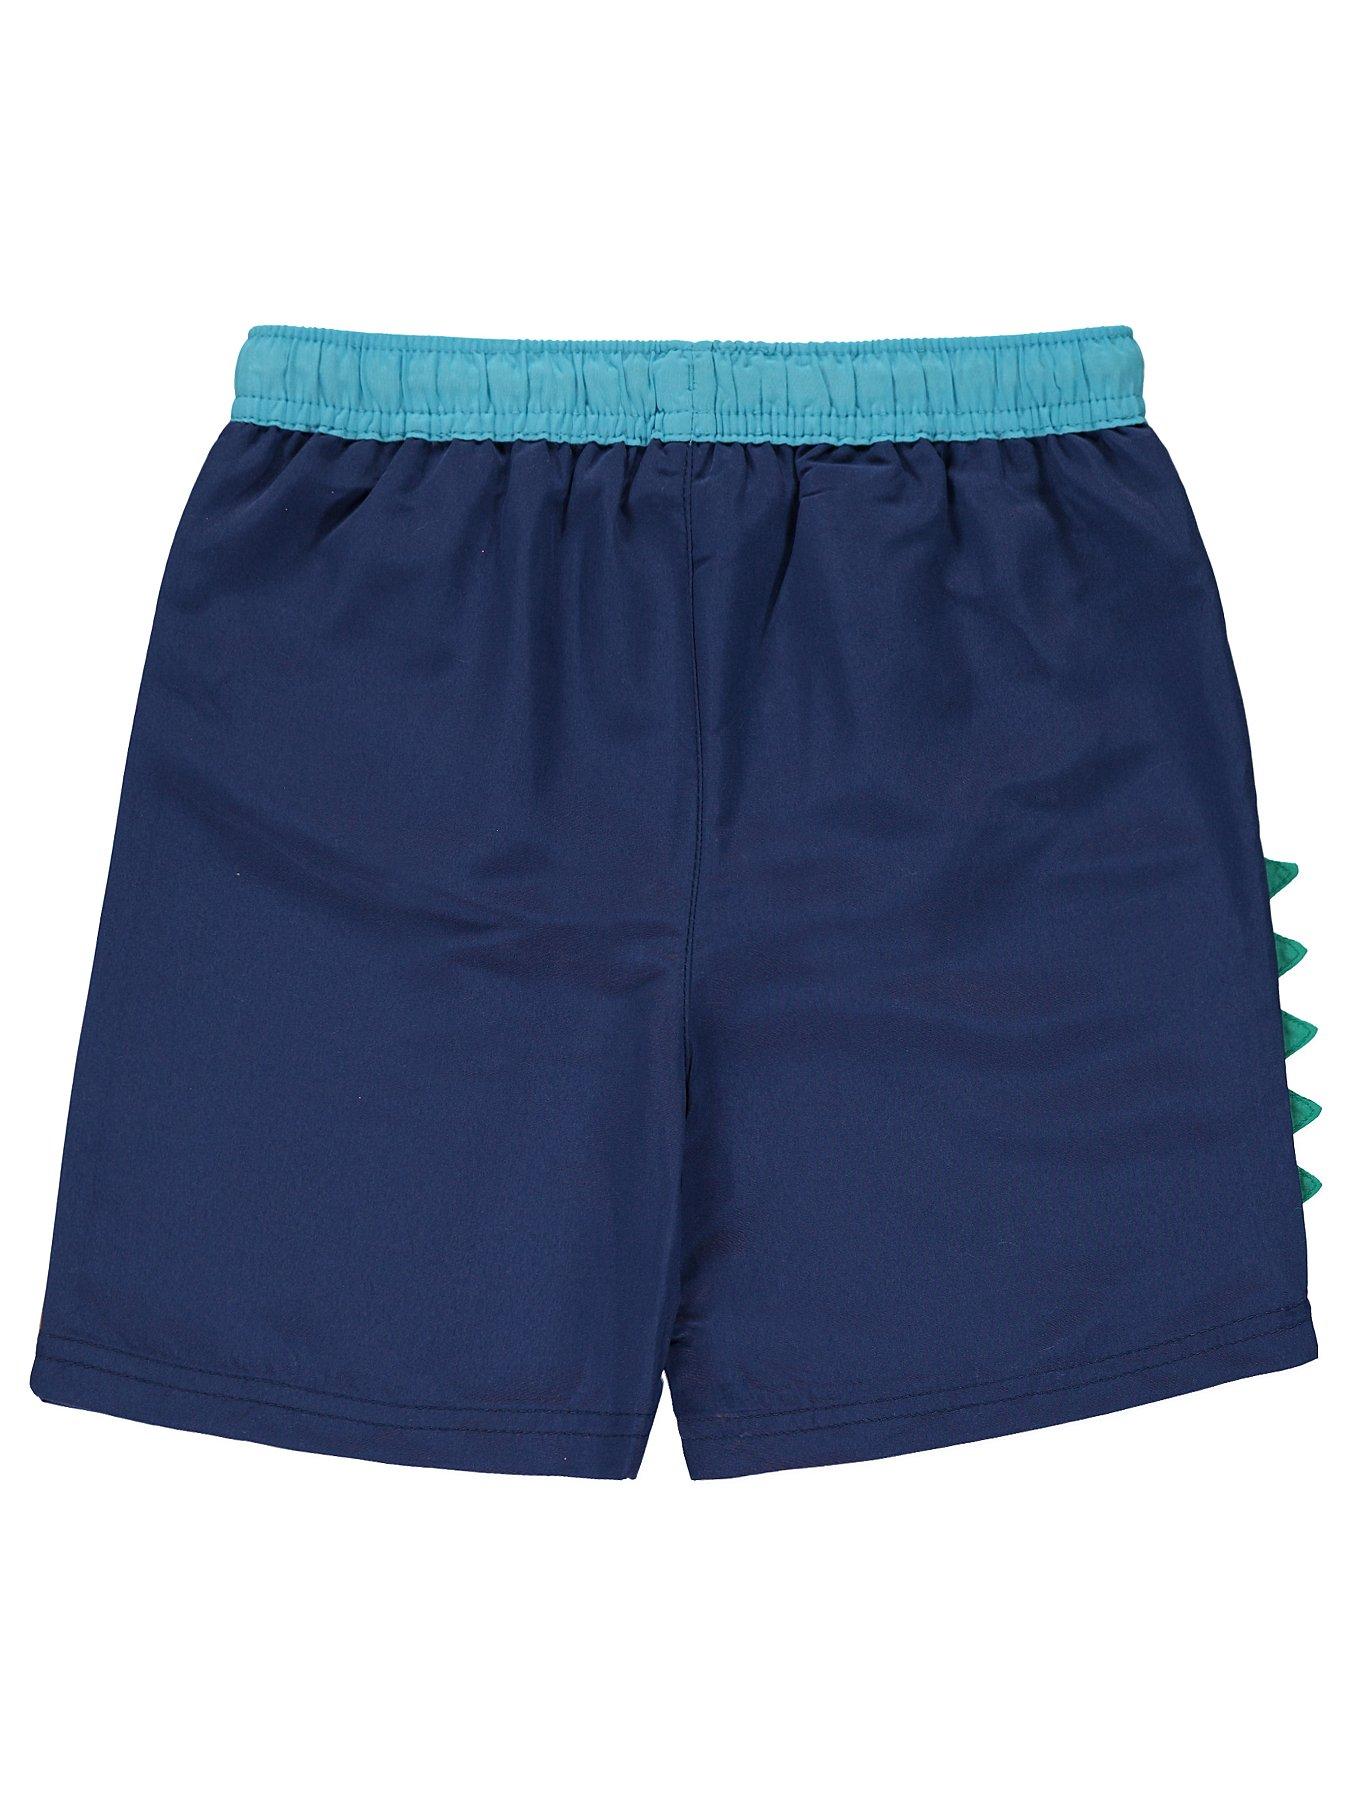 038c5de77a578 Peppa Pig George Pig Swim Shorts | Kids | George